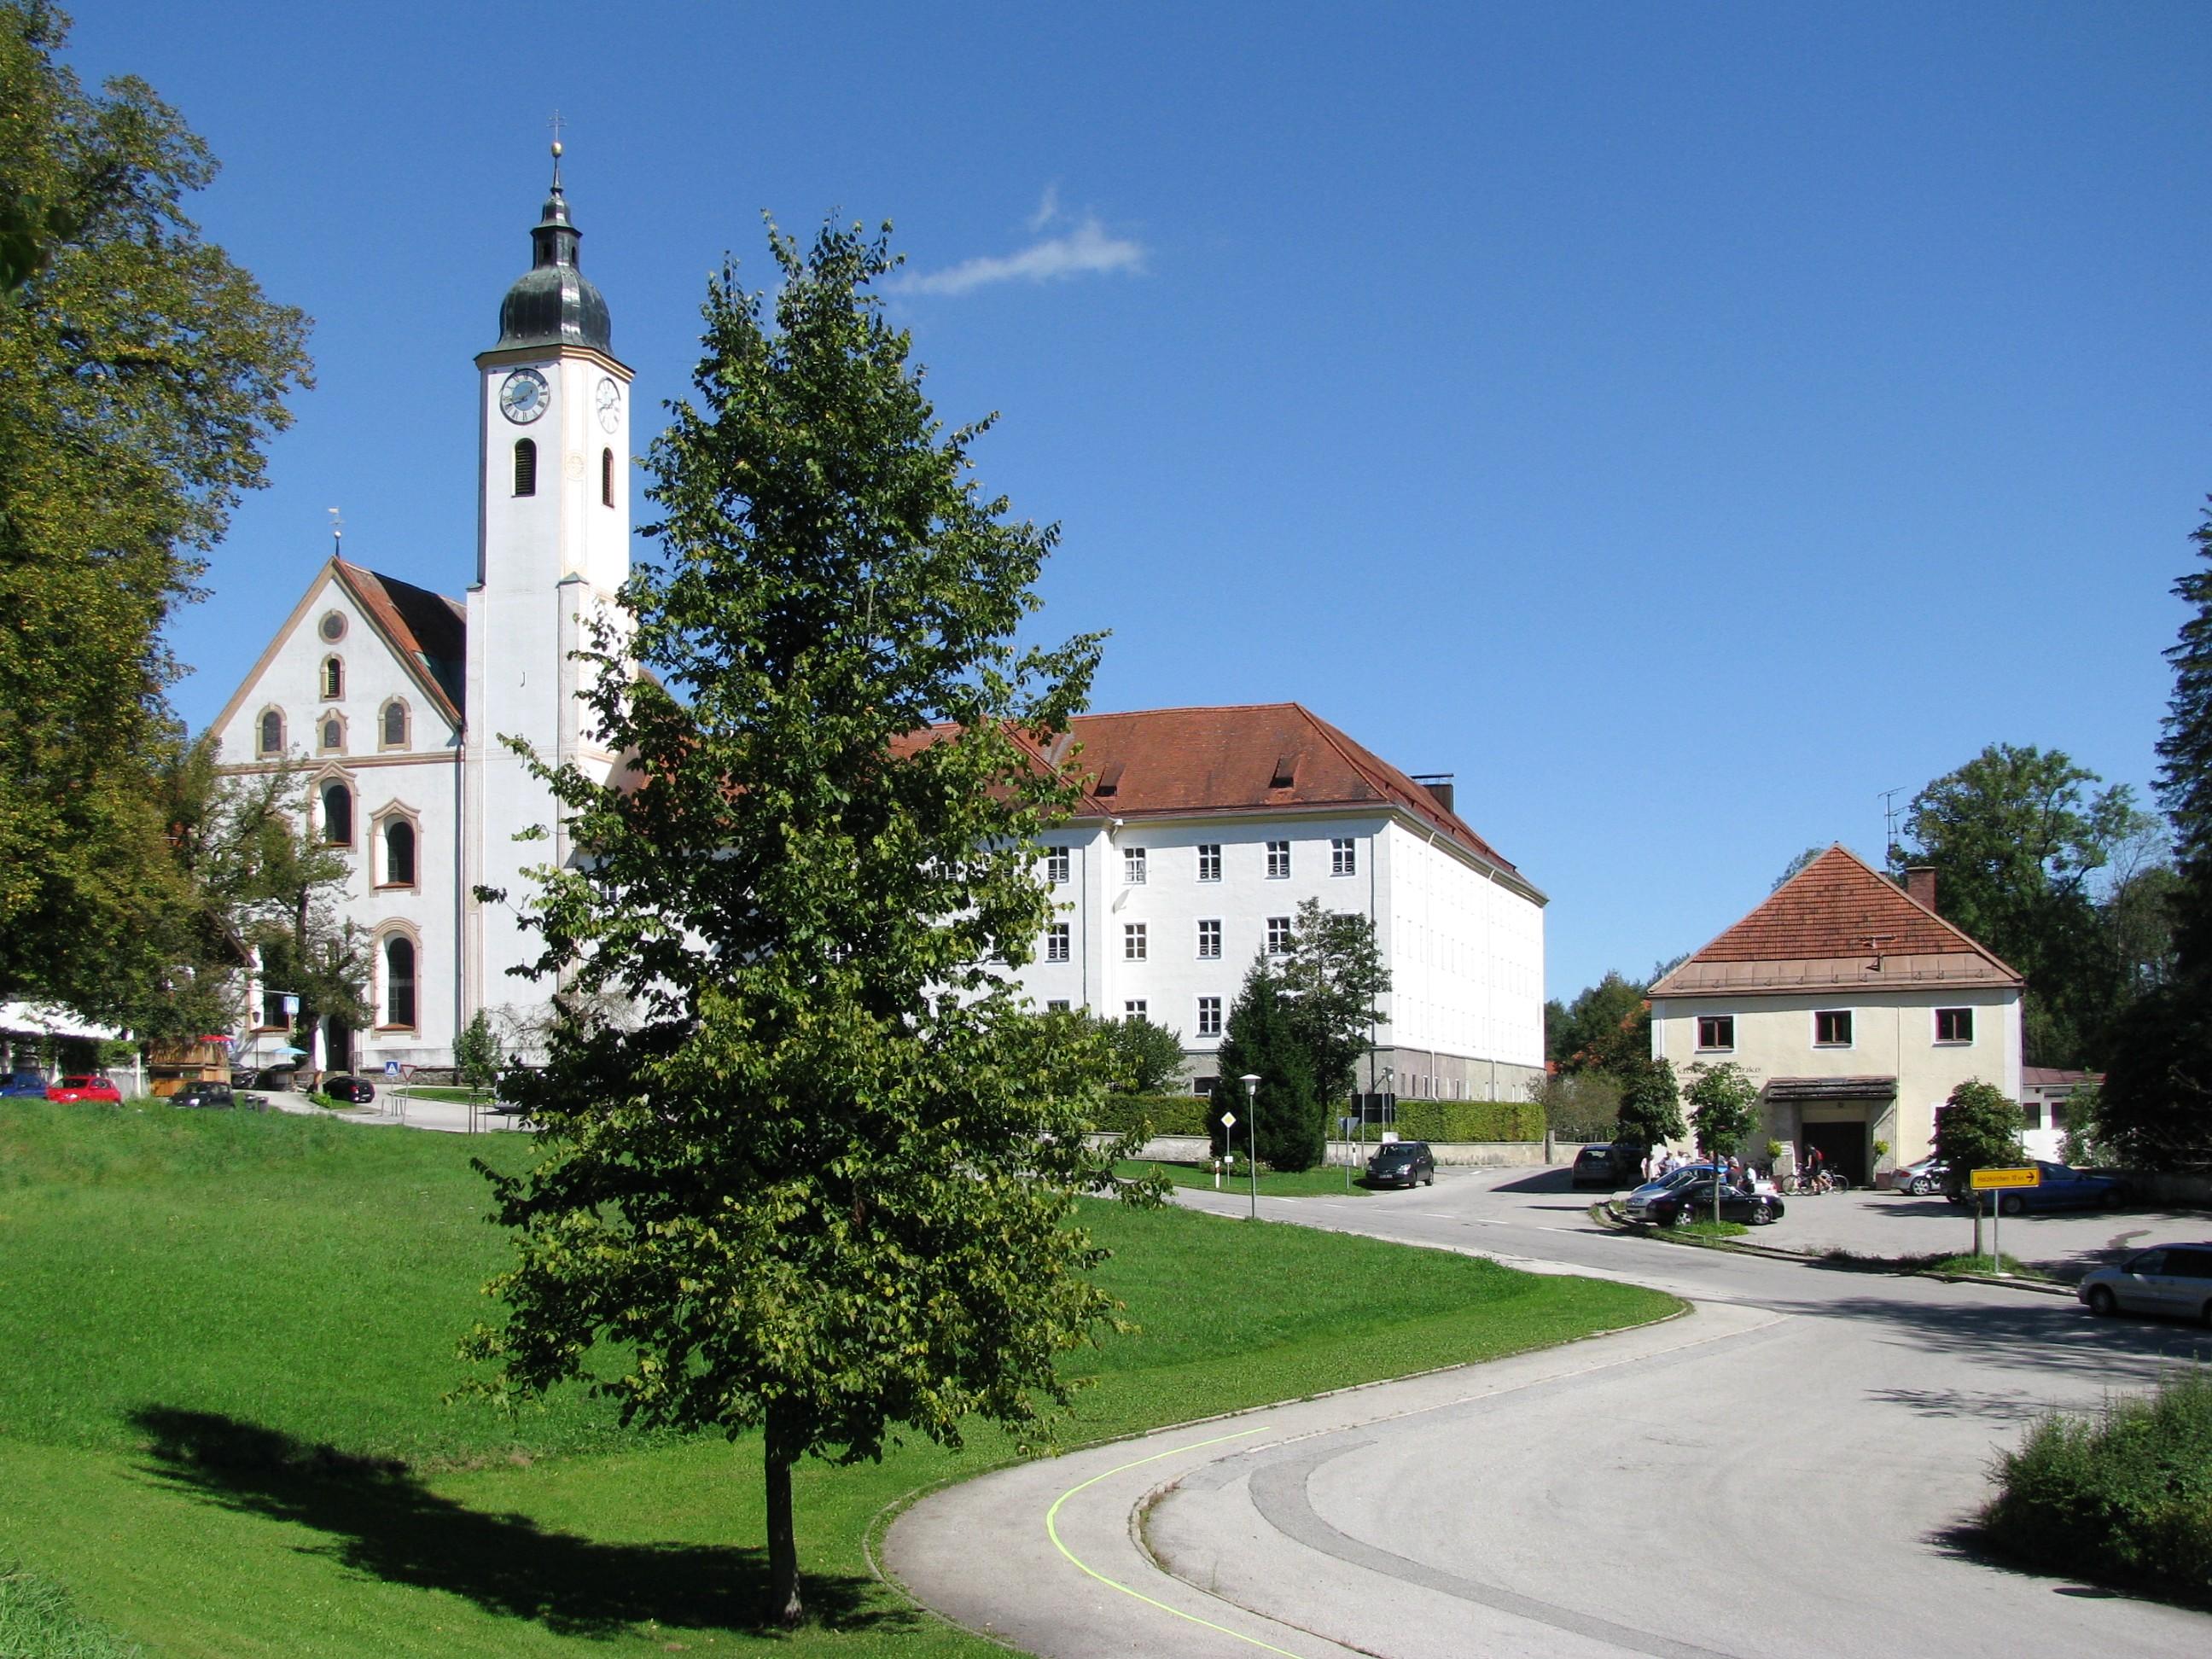 Datei:Kloster Dietramszell-GO-16.jpg – Wikipedia